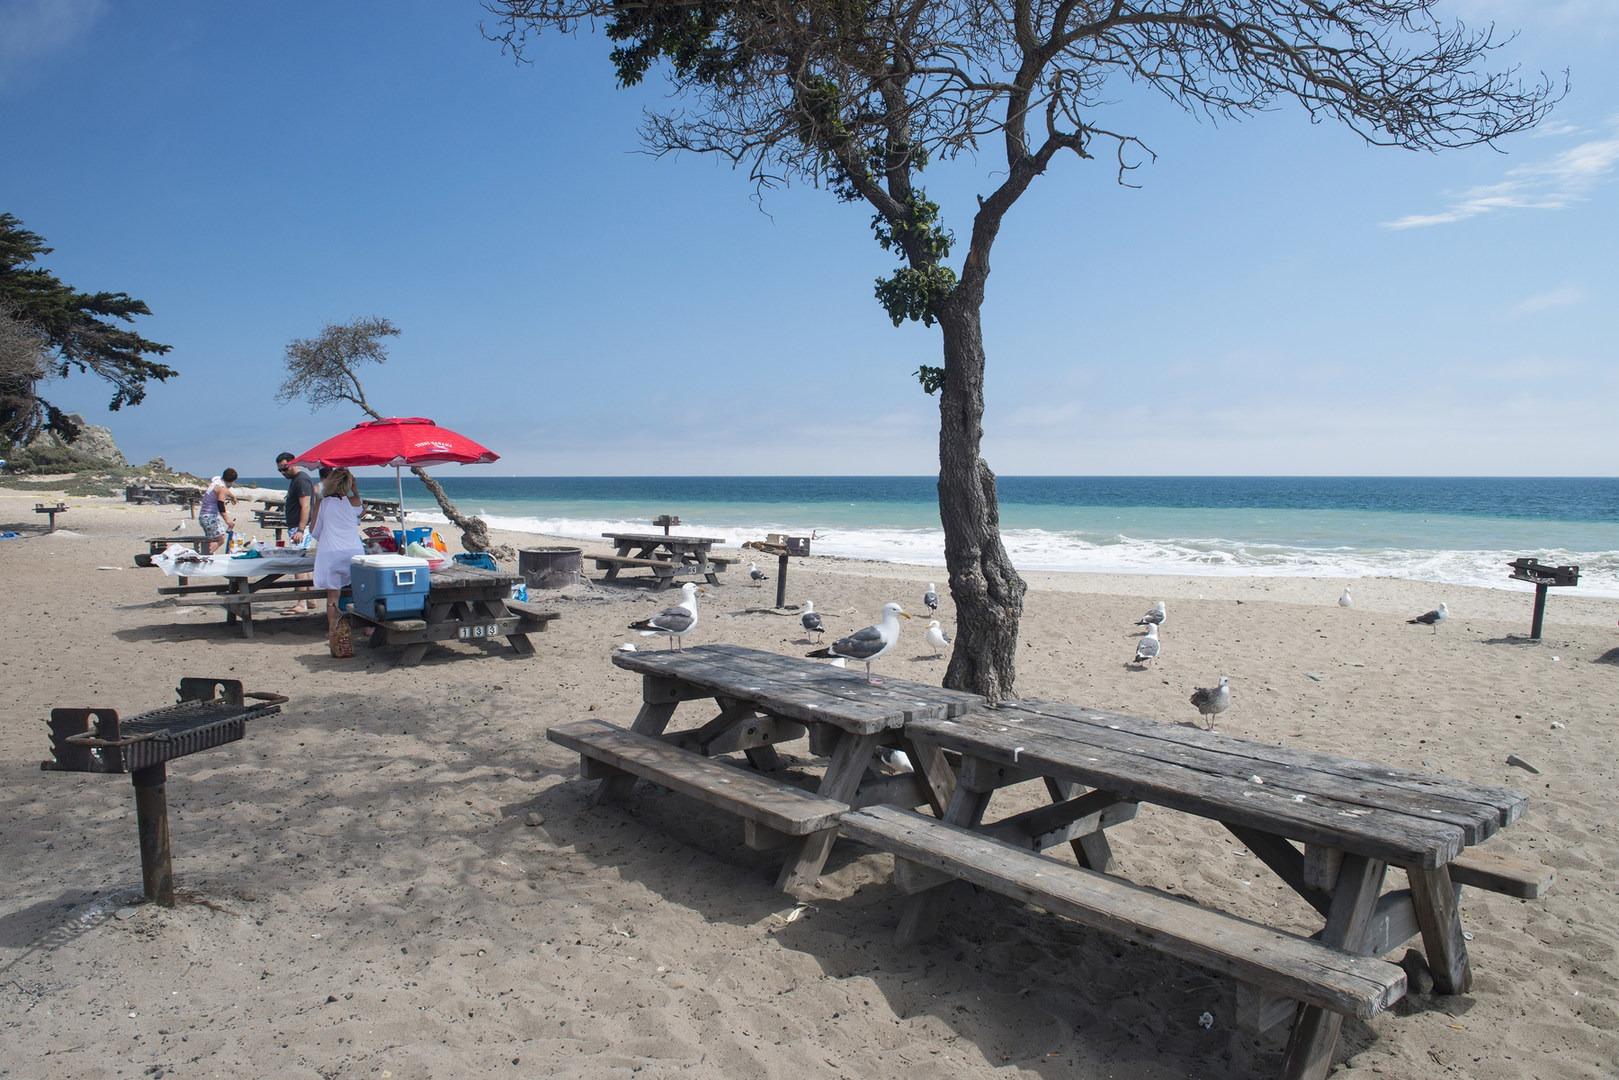 Sycamore Cove Beach